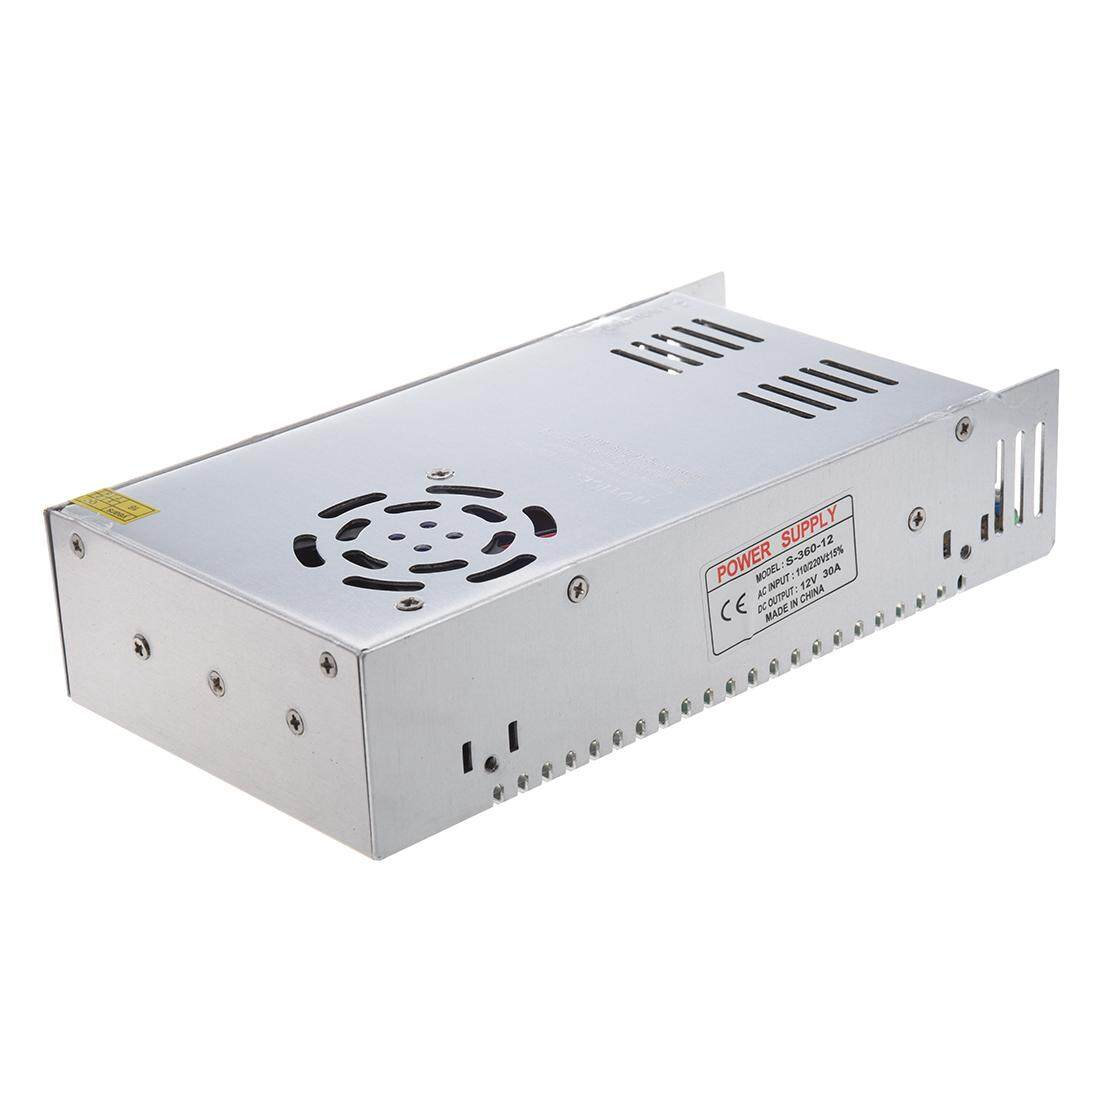 AC 110/220V DC 12V 30A 360W Switching Power Supply Converter for LED Flexable Strip Light